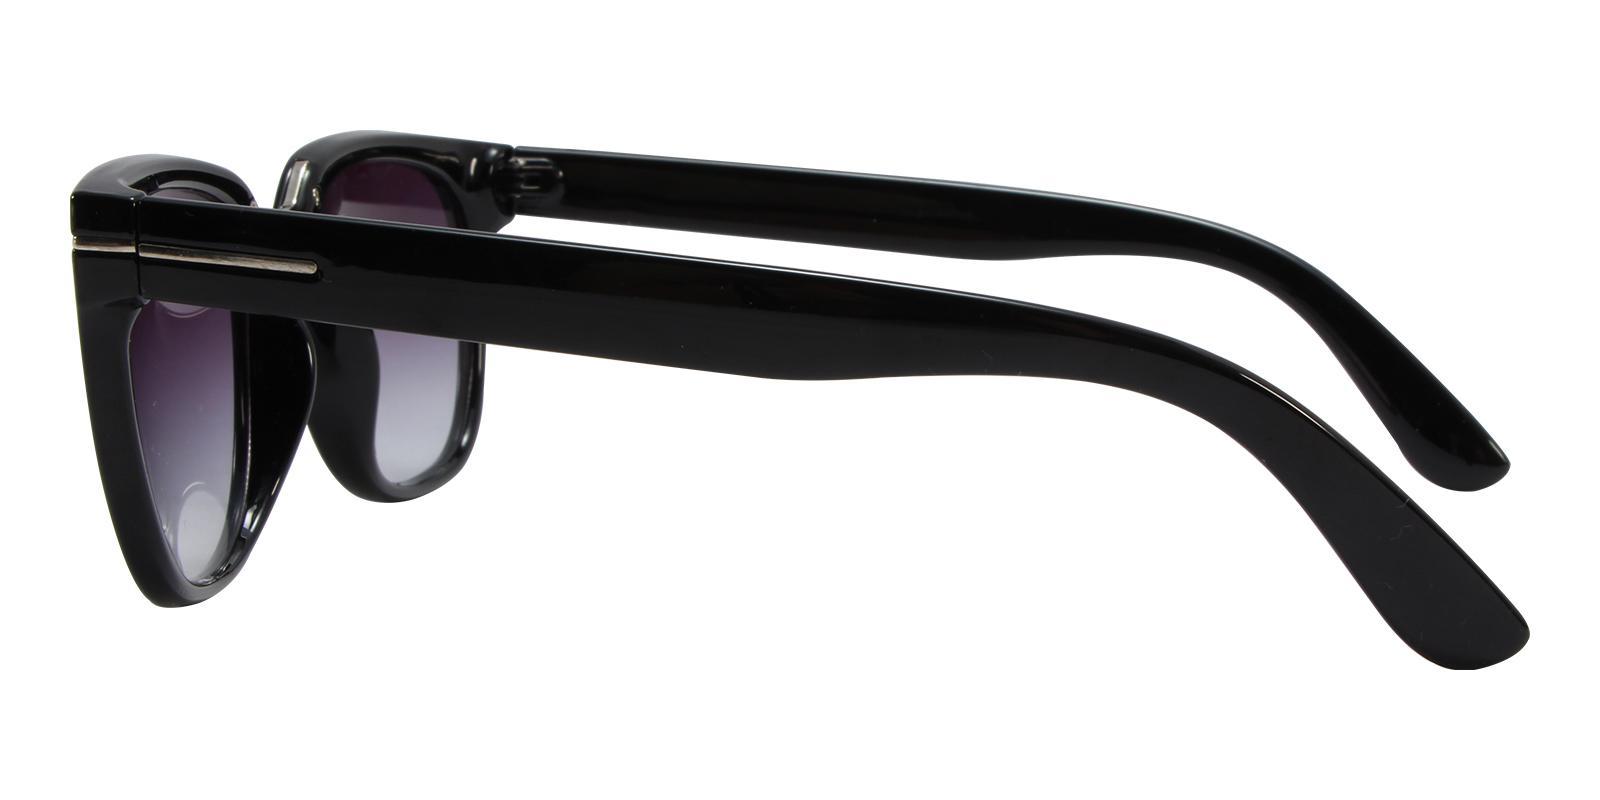 Mars Black Acetate Sunglasses , UniversalBridgeFit Frames from ABBE Glasses